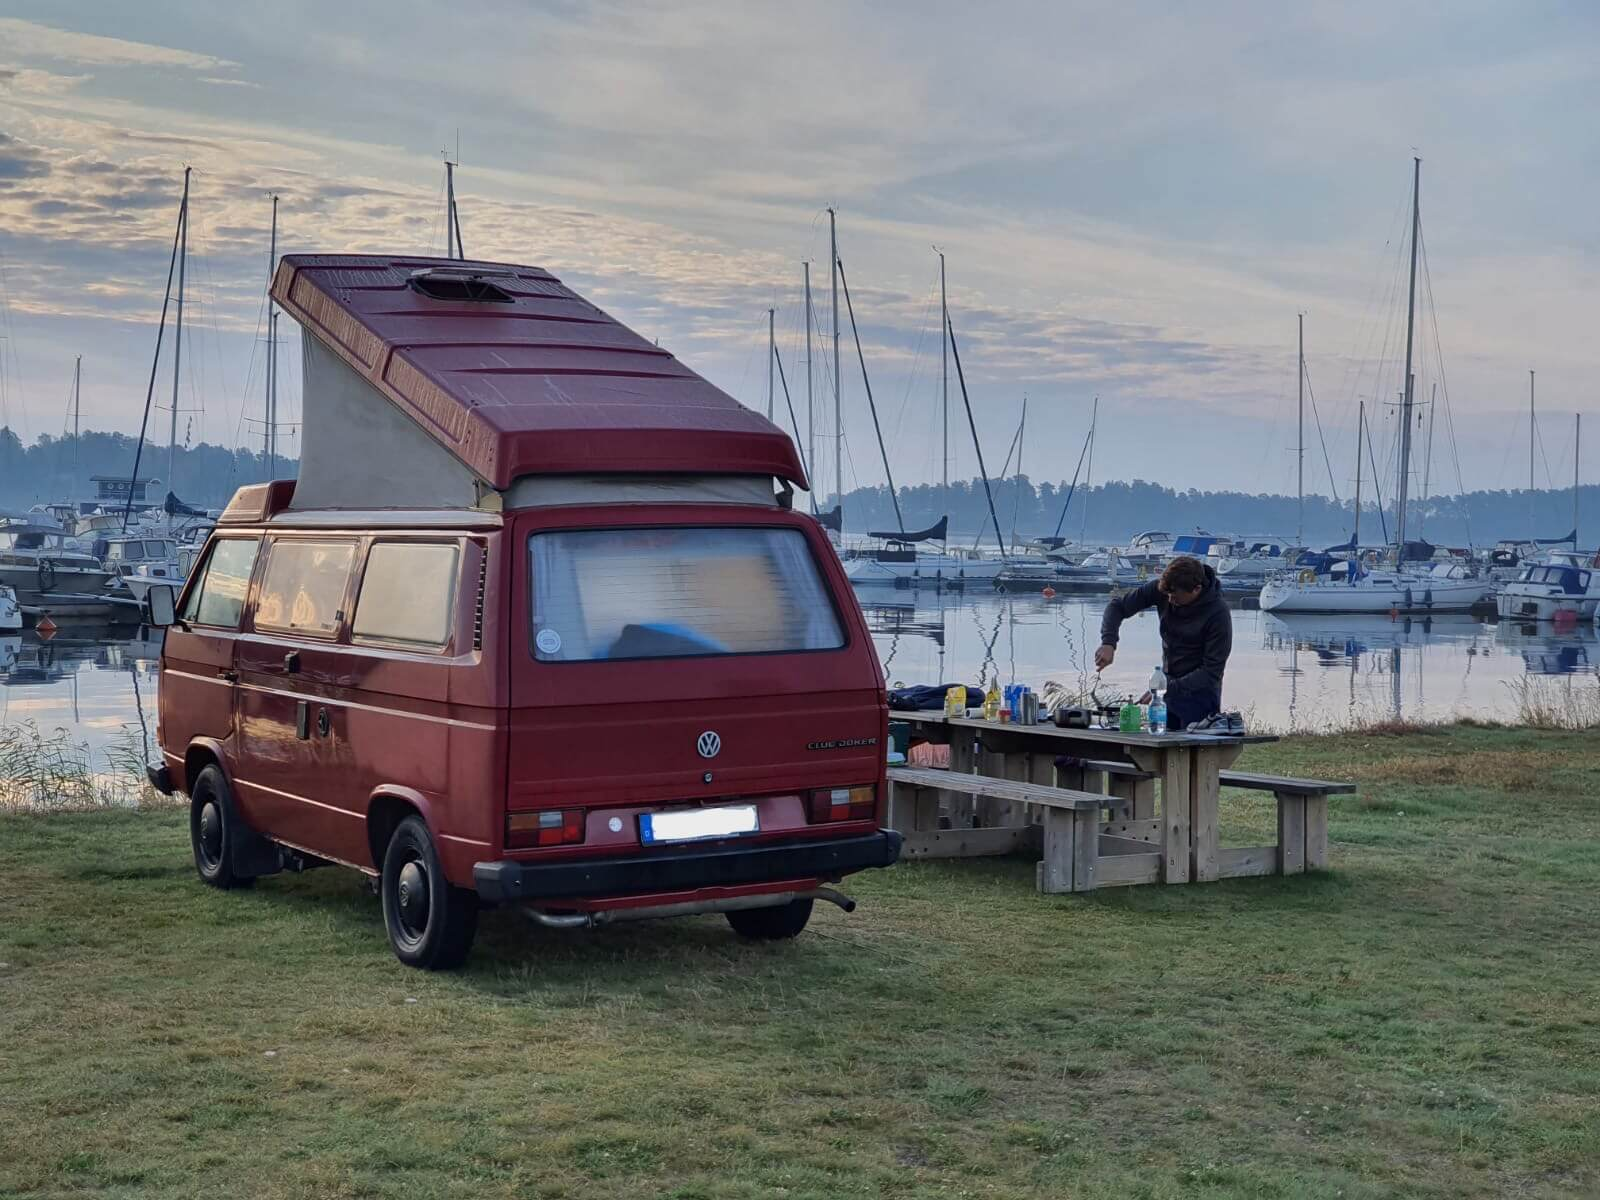 VW Bus T3 Wilma Westfalia Joker Klappdach rot Camper Bulli mieten Rostock bincampen direkt am Wasser Schweden